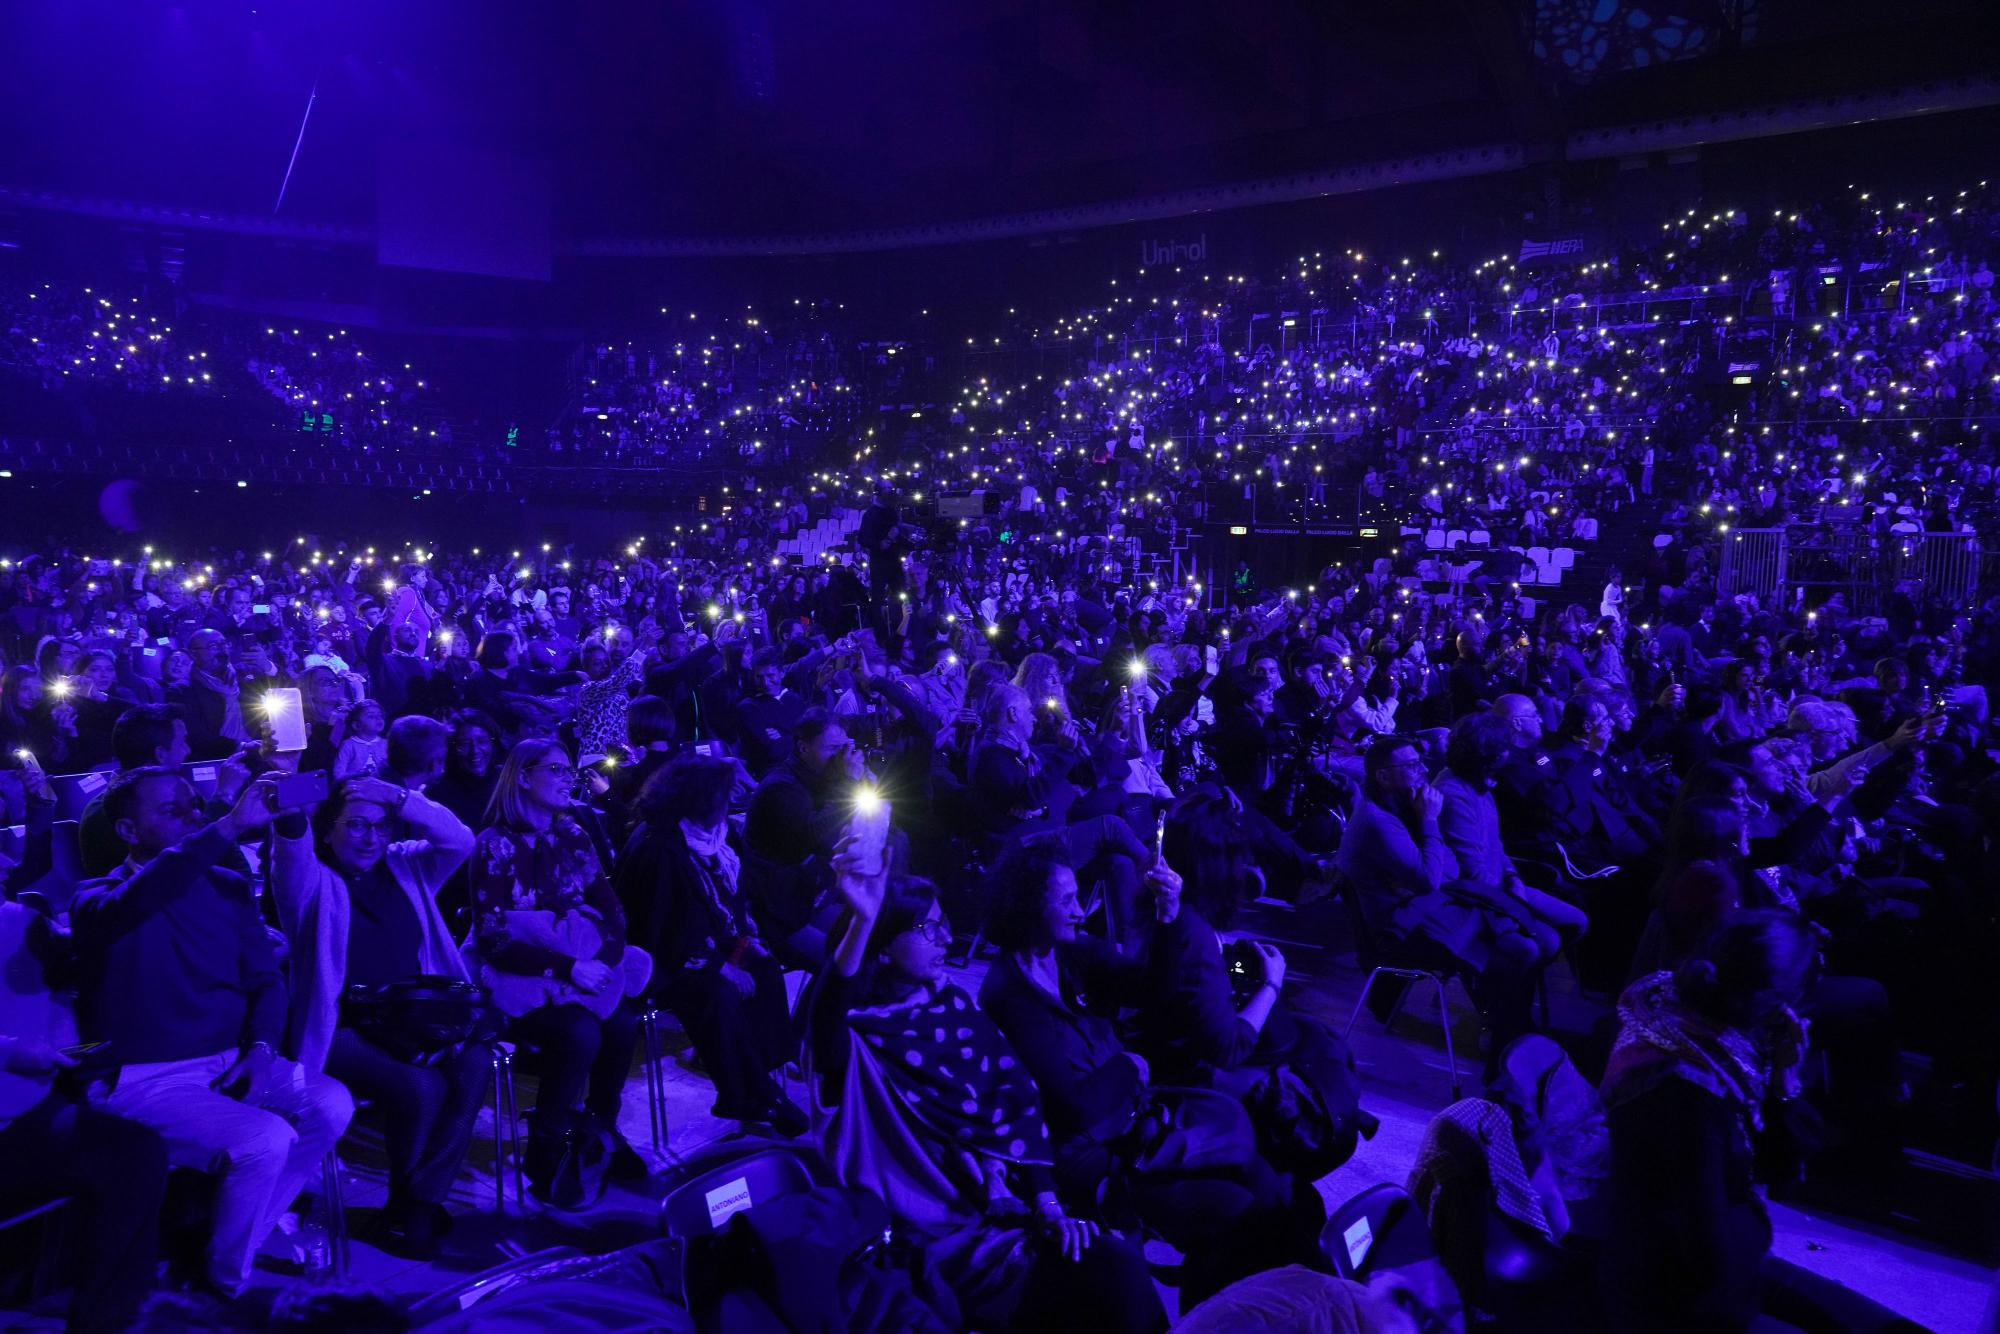 62° Zecchino d'Oro Unipol Arena 2019